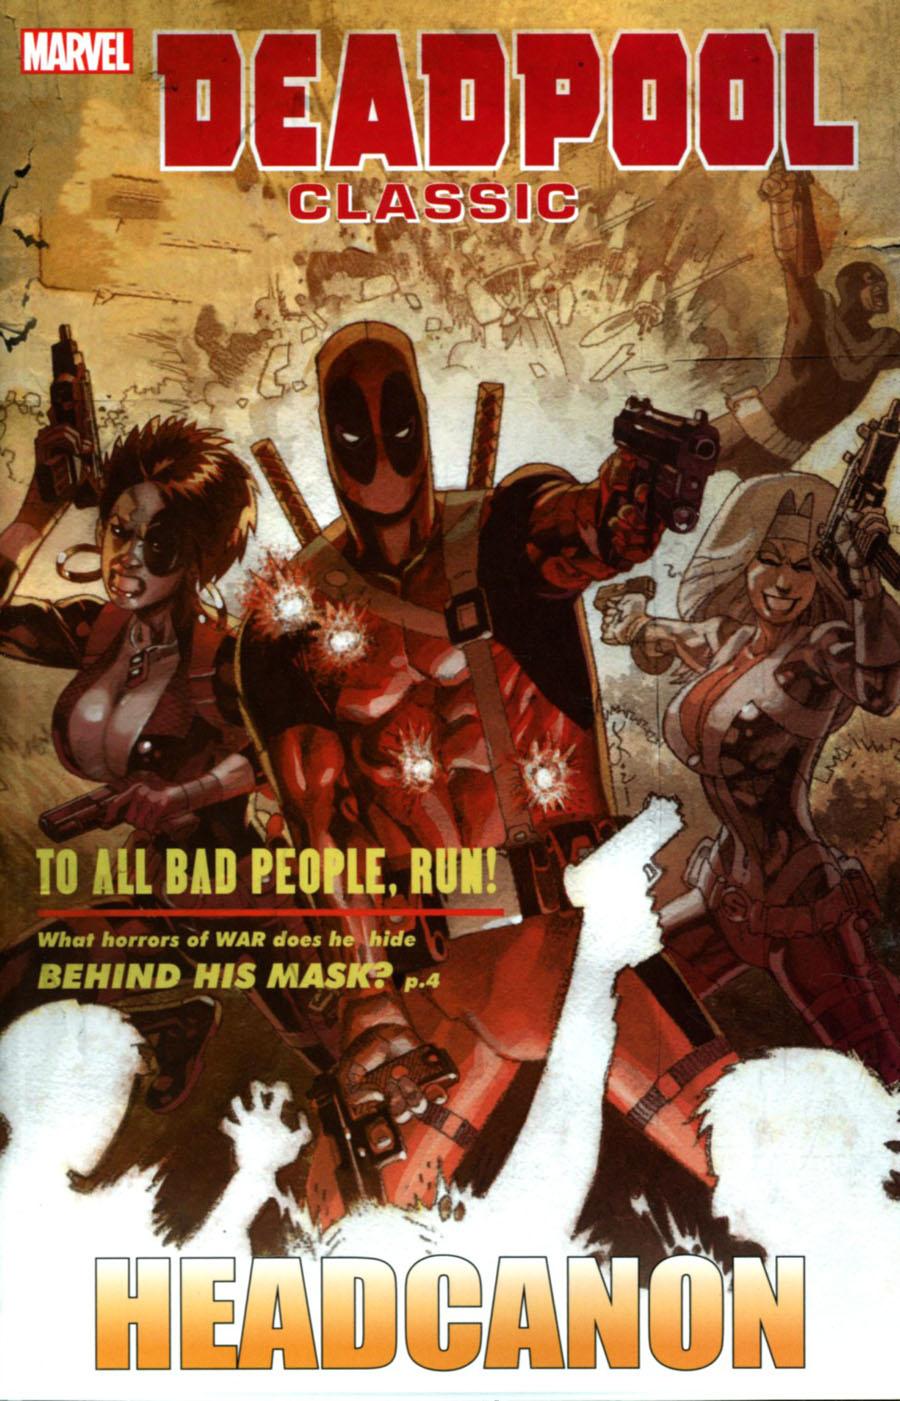 Deadpool Classic Vol 17 Headcanon TP